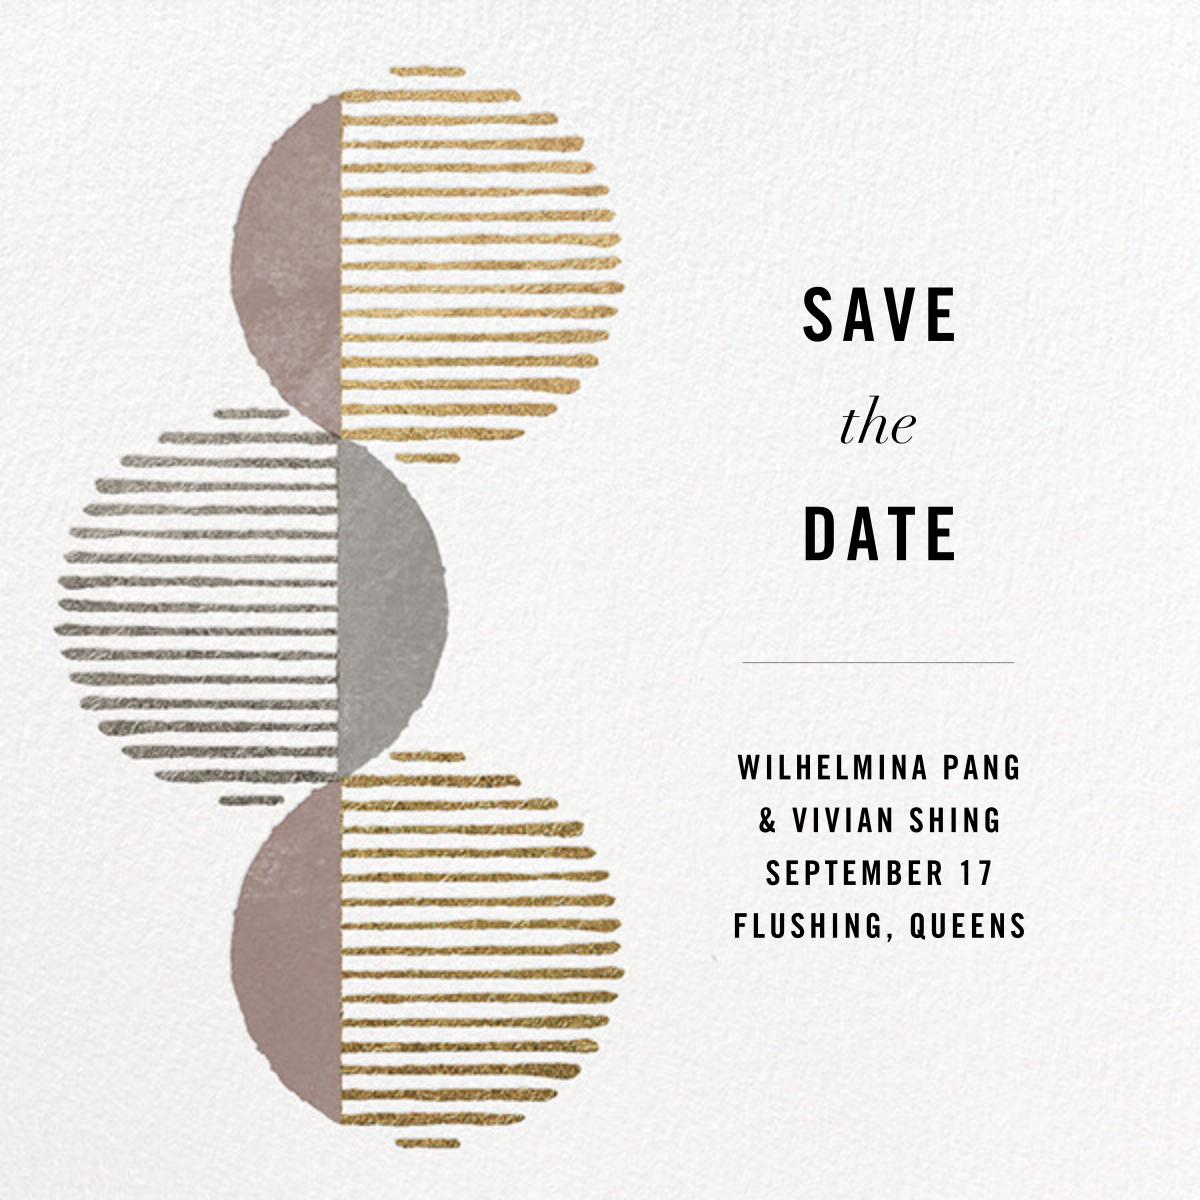 Saros - Kelly Wearstler - Save the date